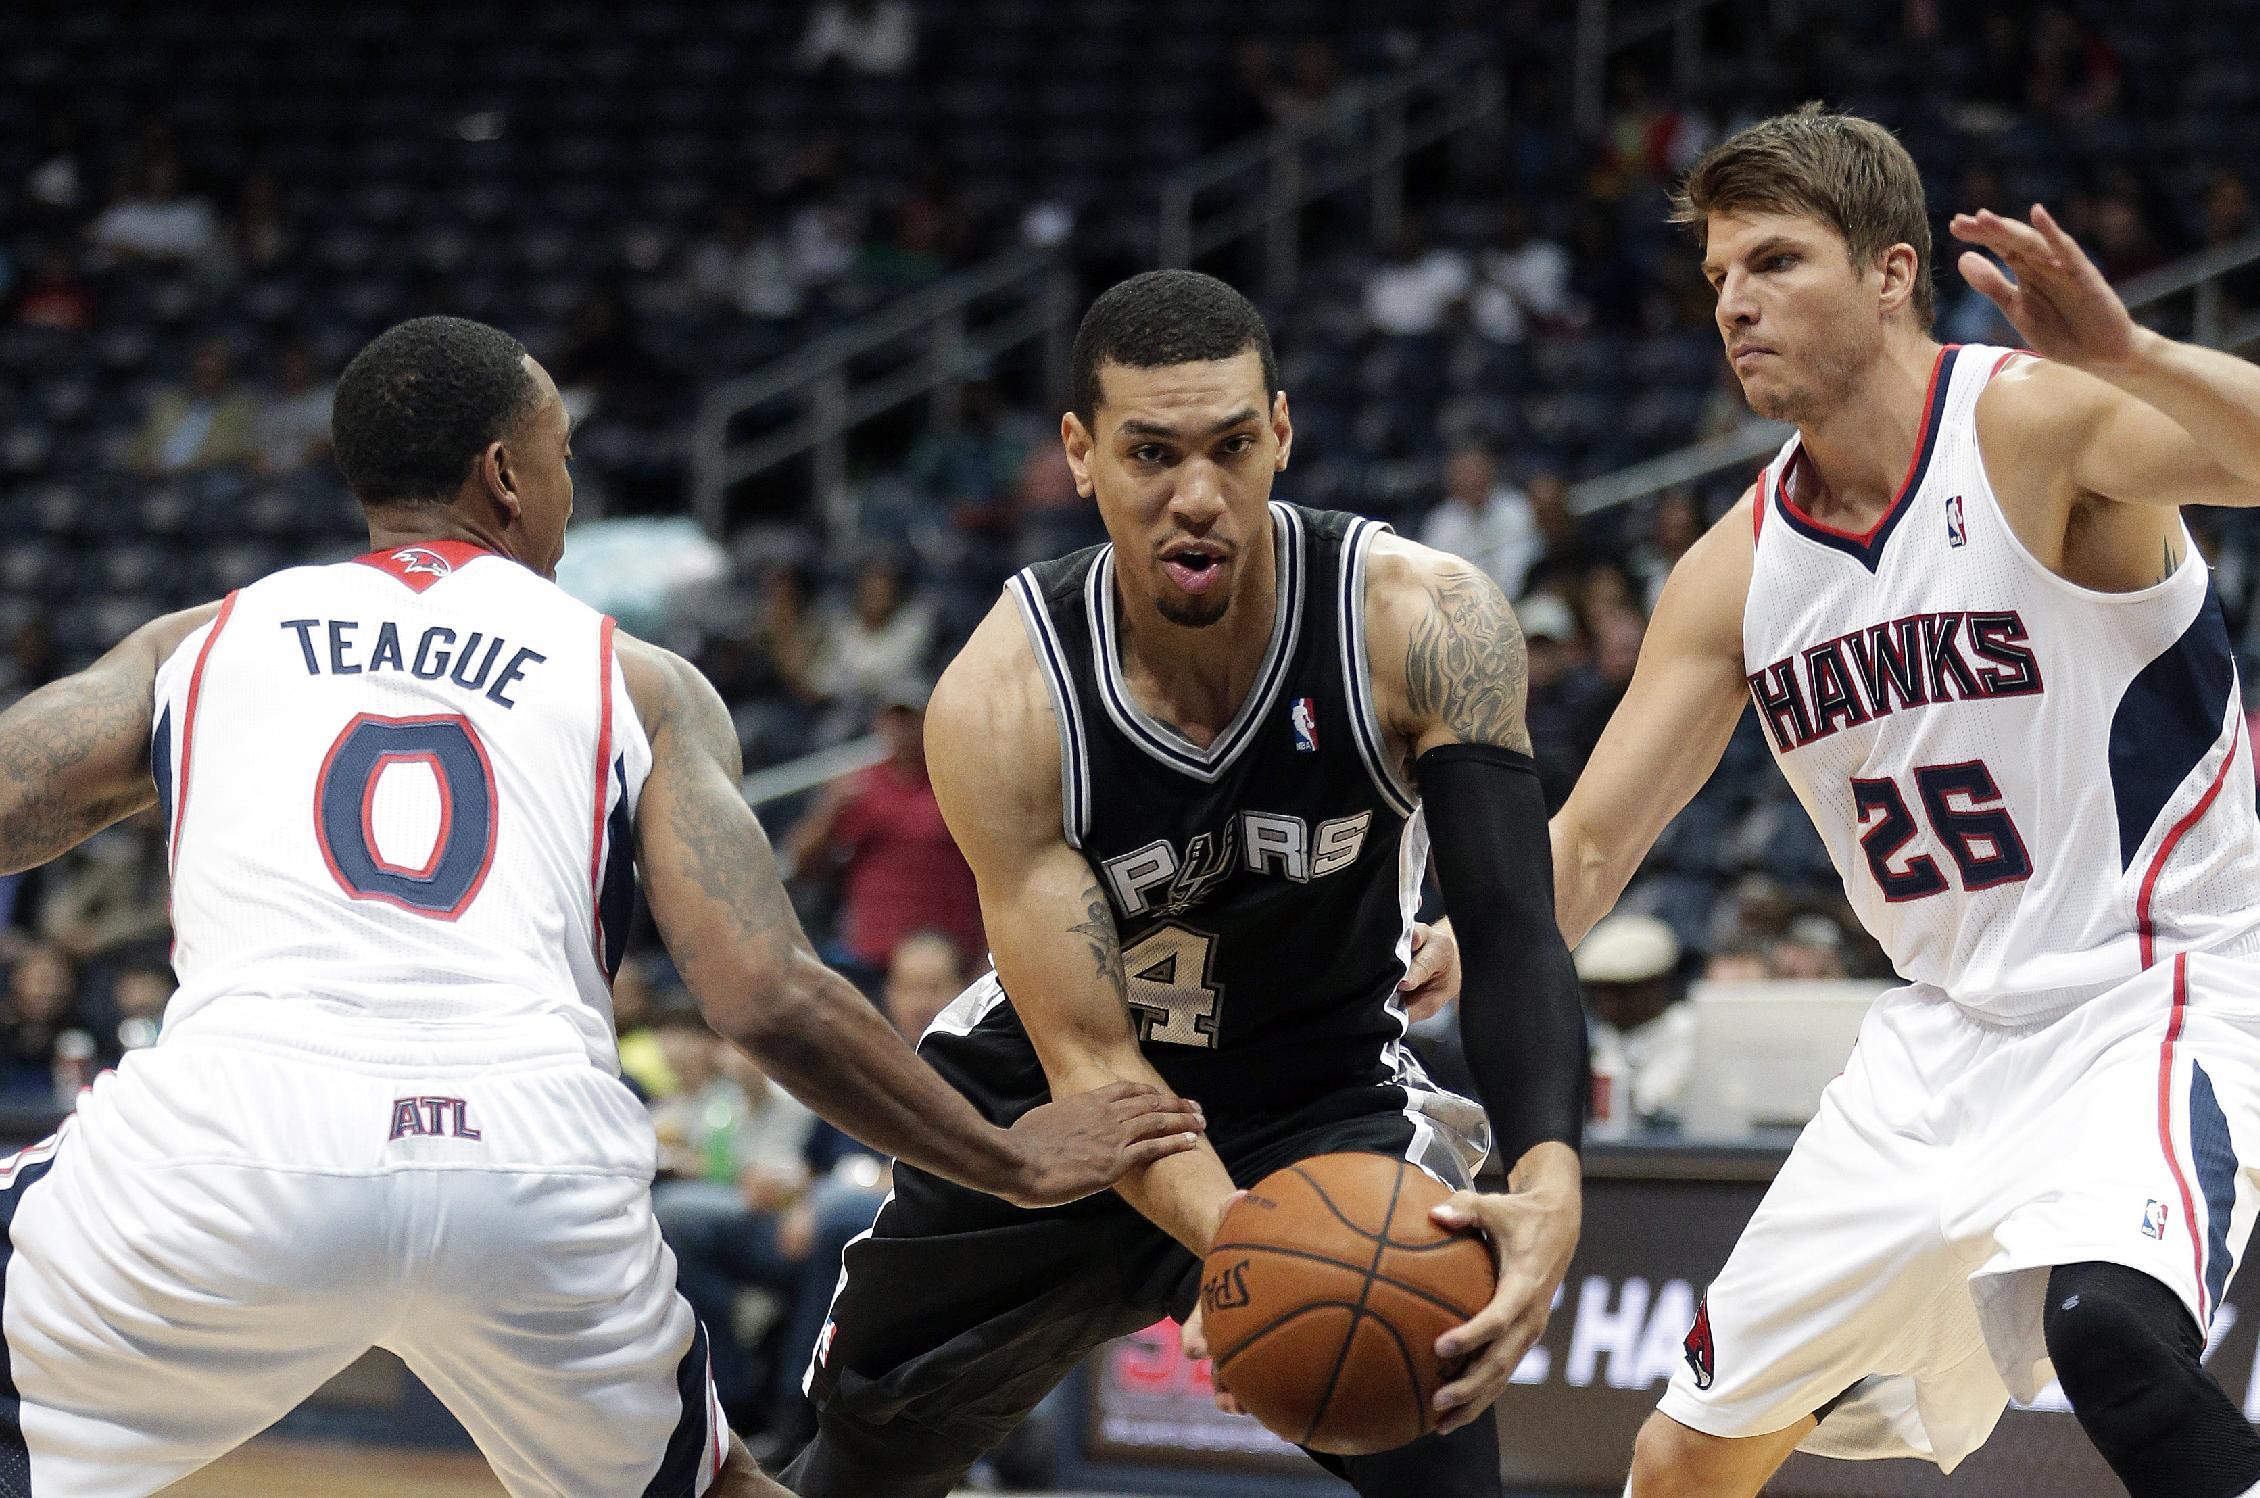 Spurs top Hawks 106-104 on Baynes' late basket